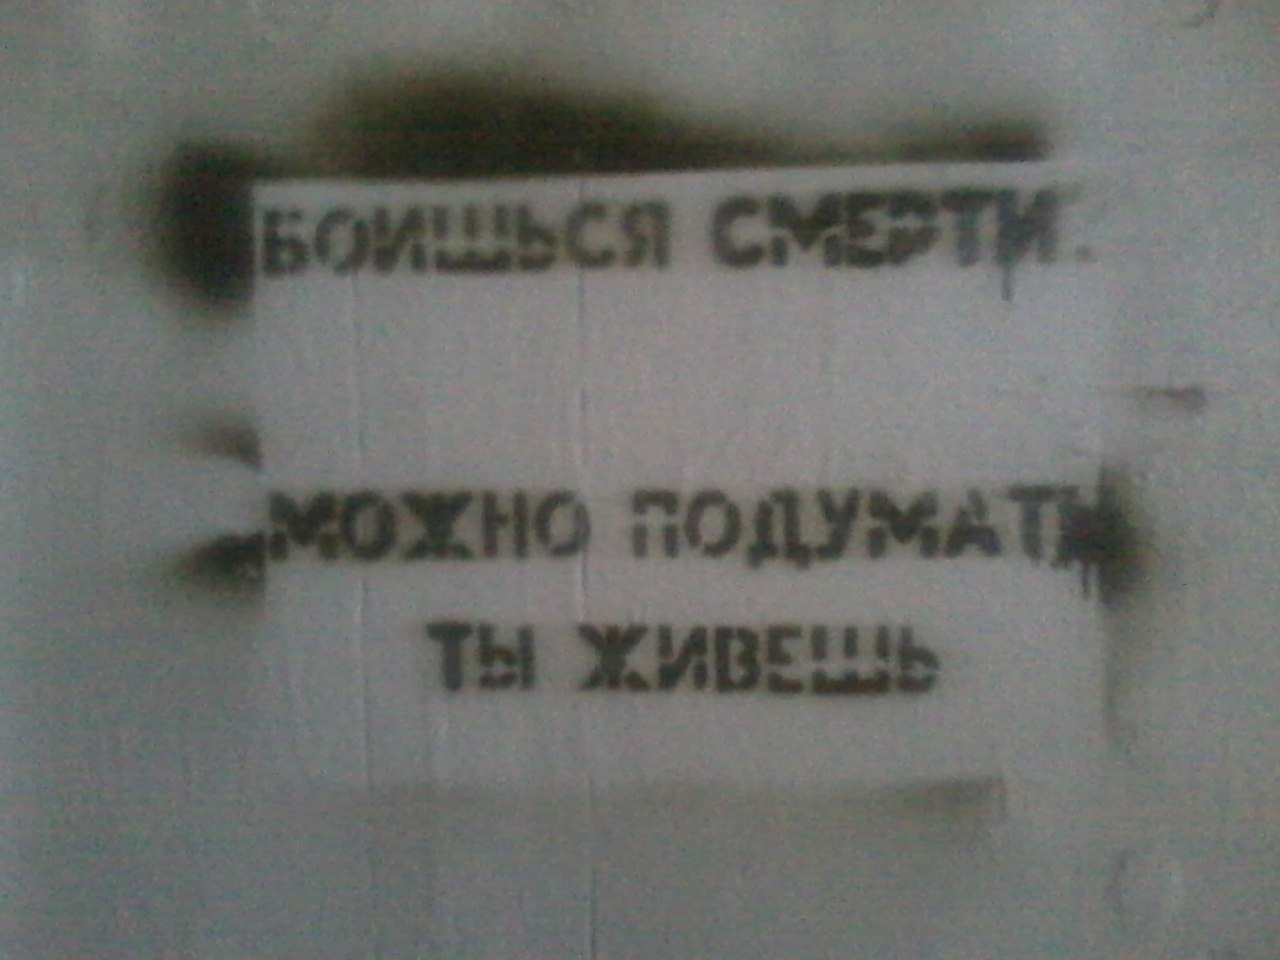 http://cs419717.vk.me/v419717272/c282/Ki2tkaQQF4s.jpg